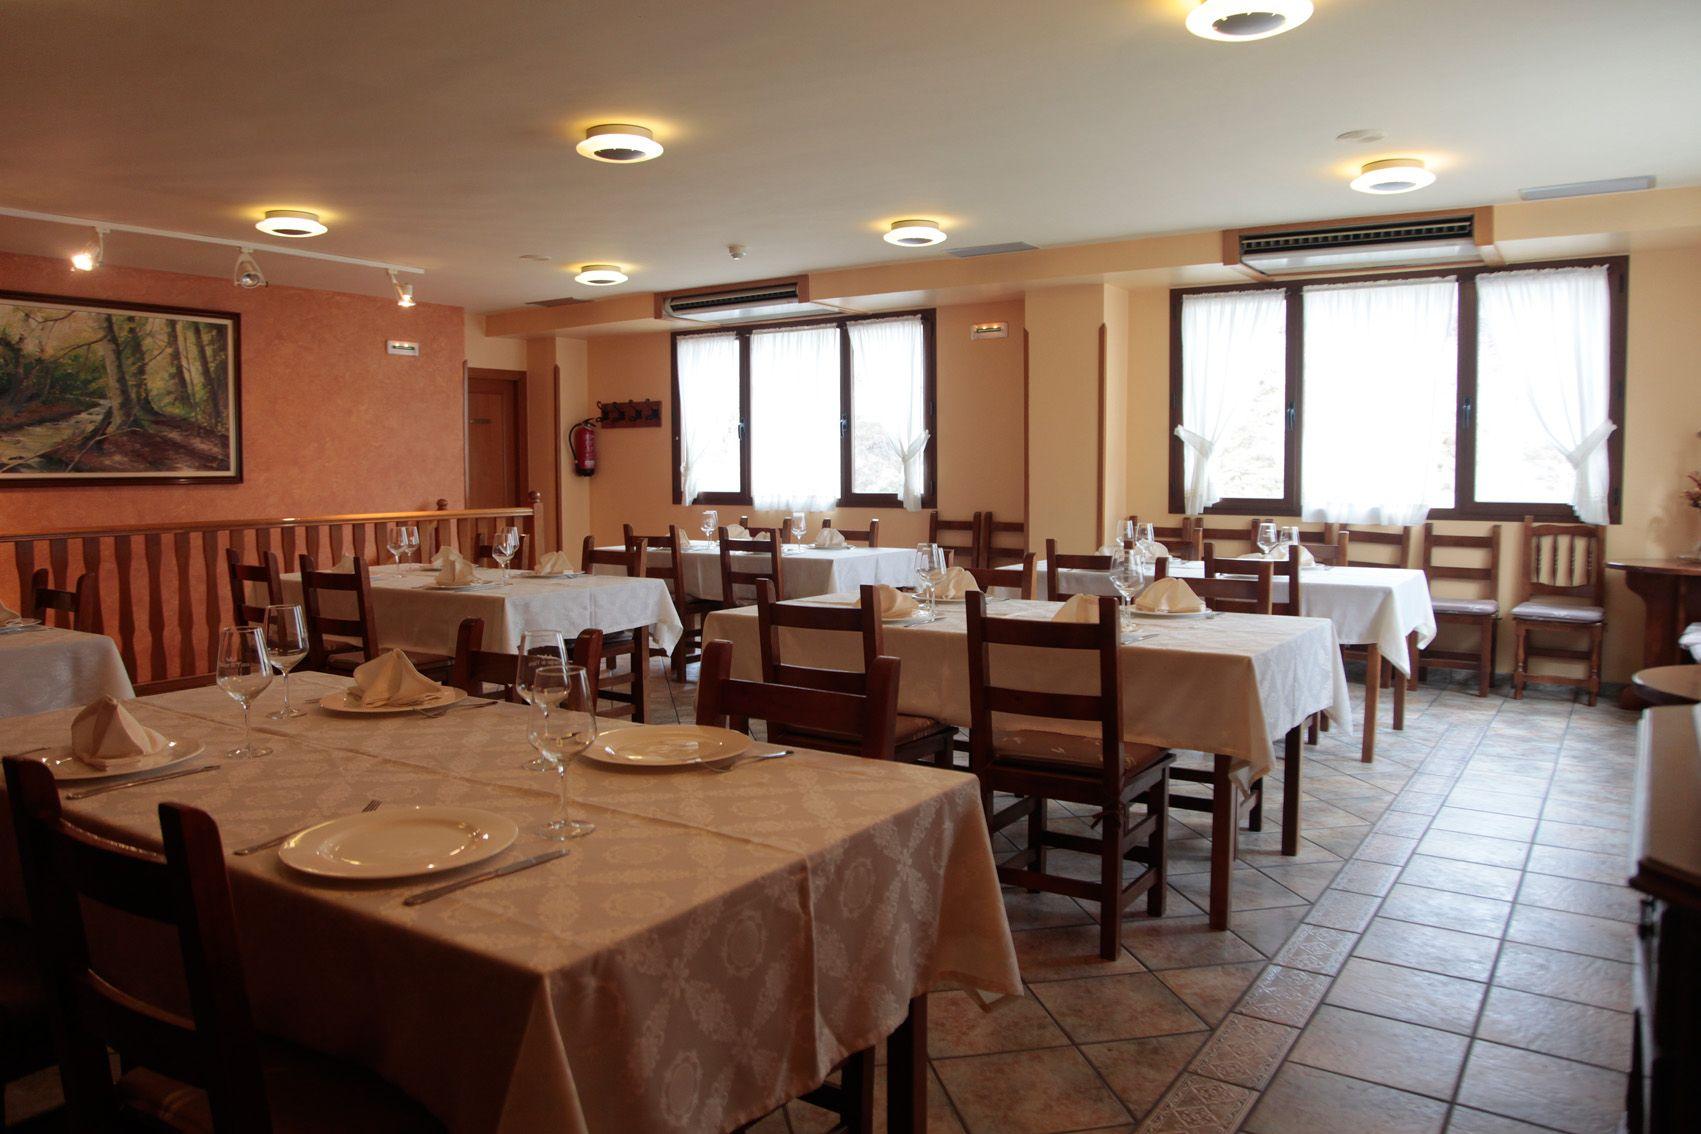 Foto 5 de Restaurante en Juslapeña | Restaurante Casa Arteta